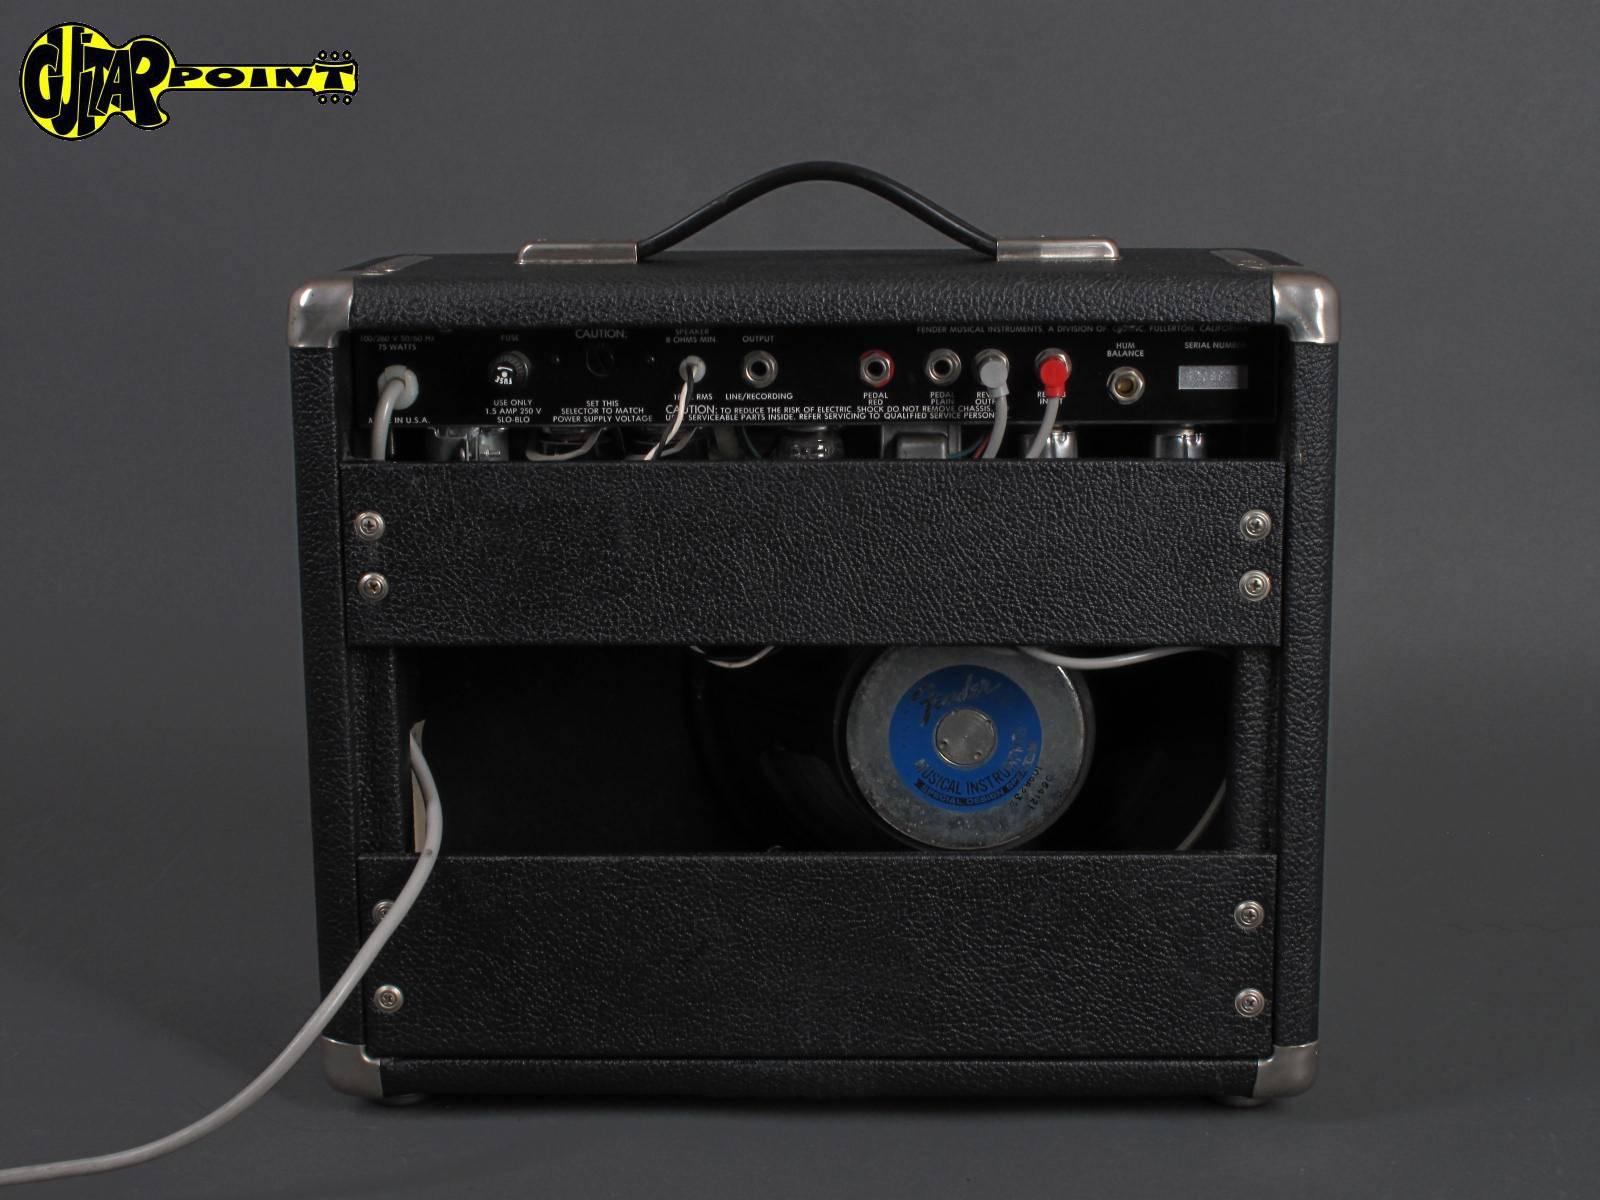 1982 fender super champ amp rivera vi82fesuchamp208911. Black Bedroom Furniture Sets. Home Design Ideas